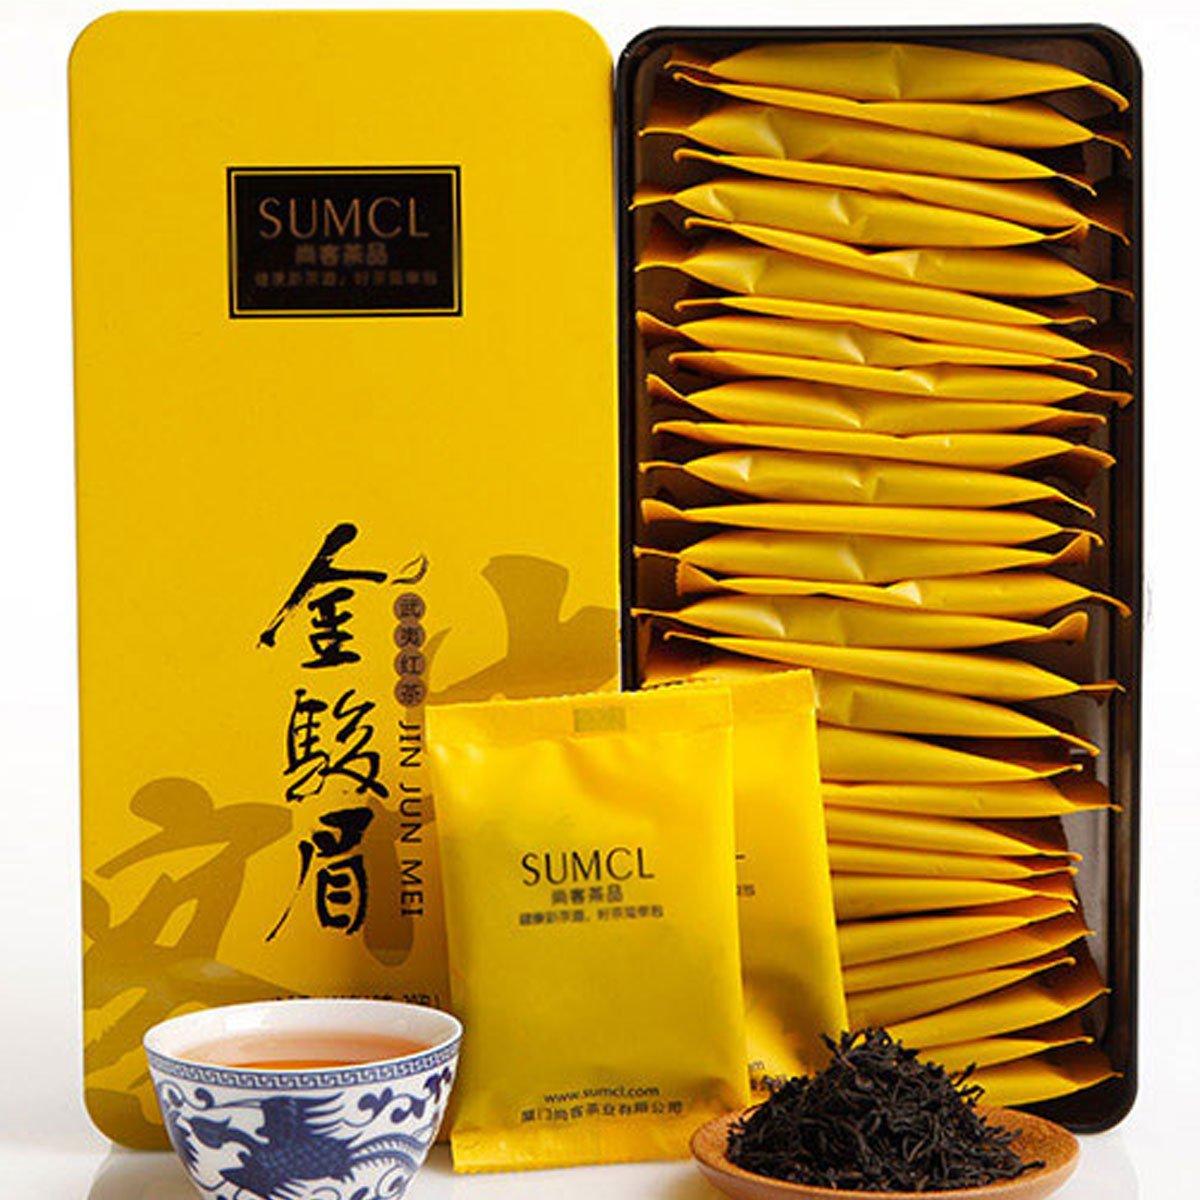 Chinese High Mountain Picked Black Tea (100g Jin Jun Mei)